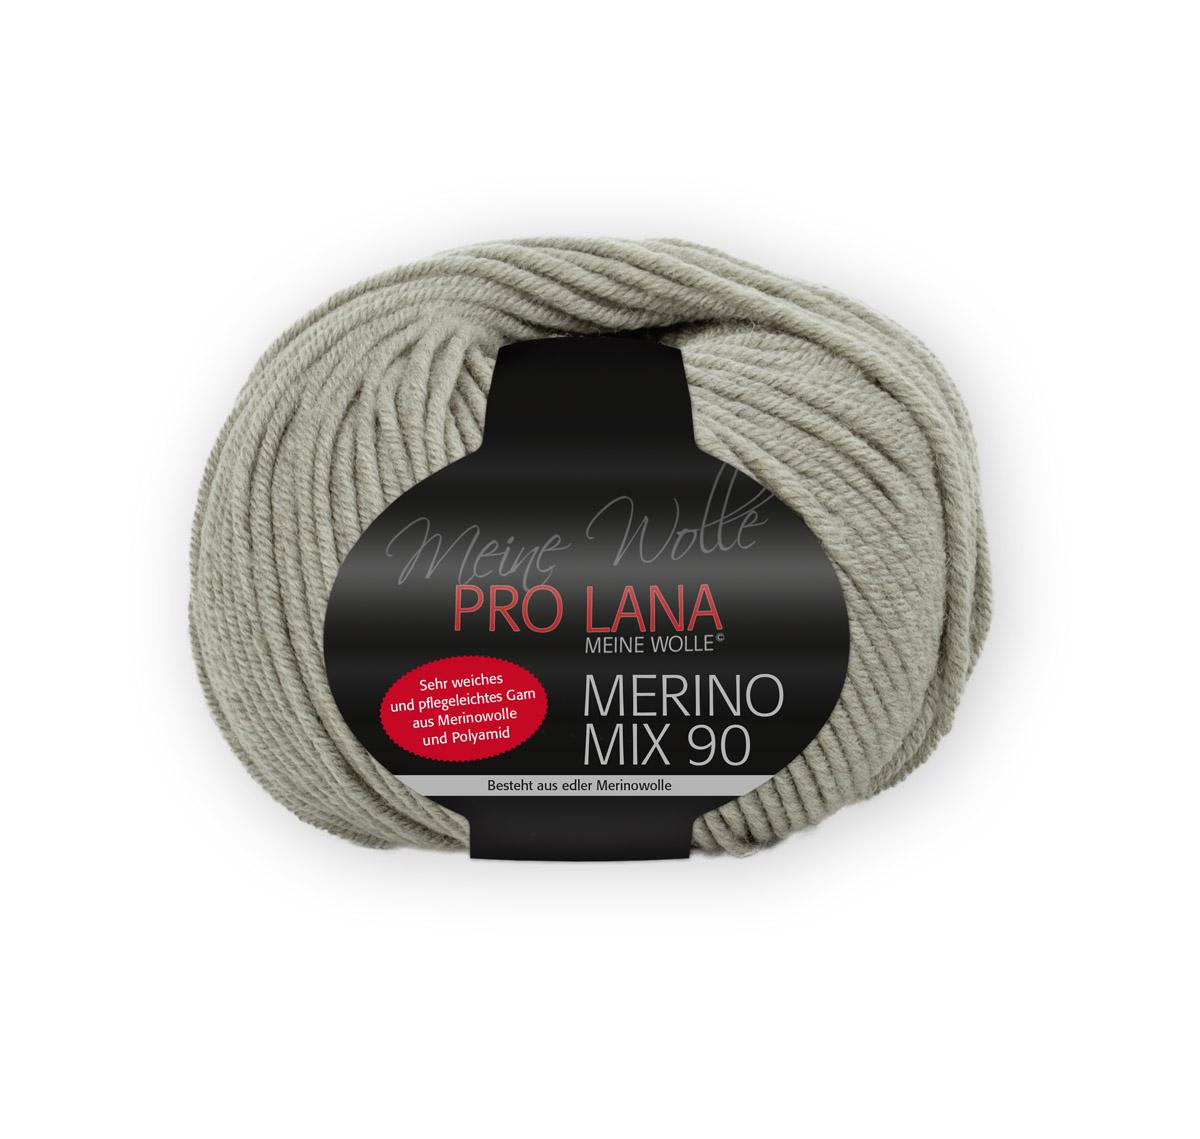 Pro Lana Merino Mix 90   50g  0,5kg